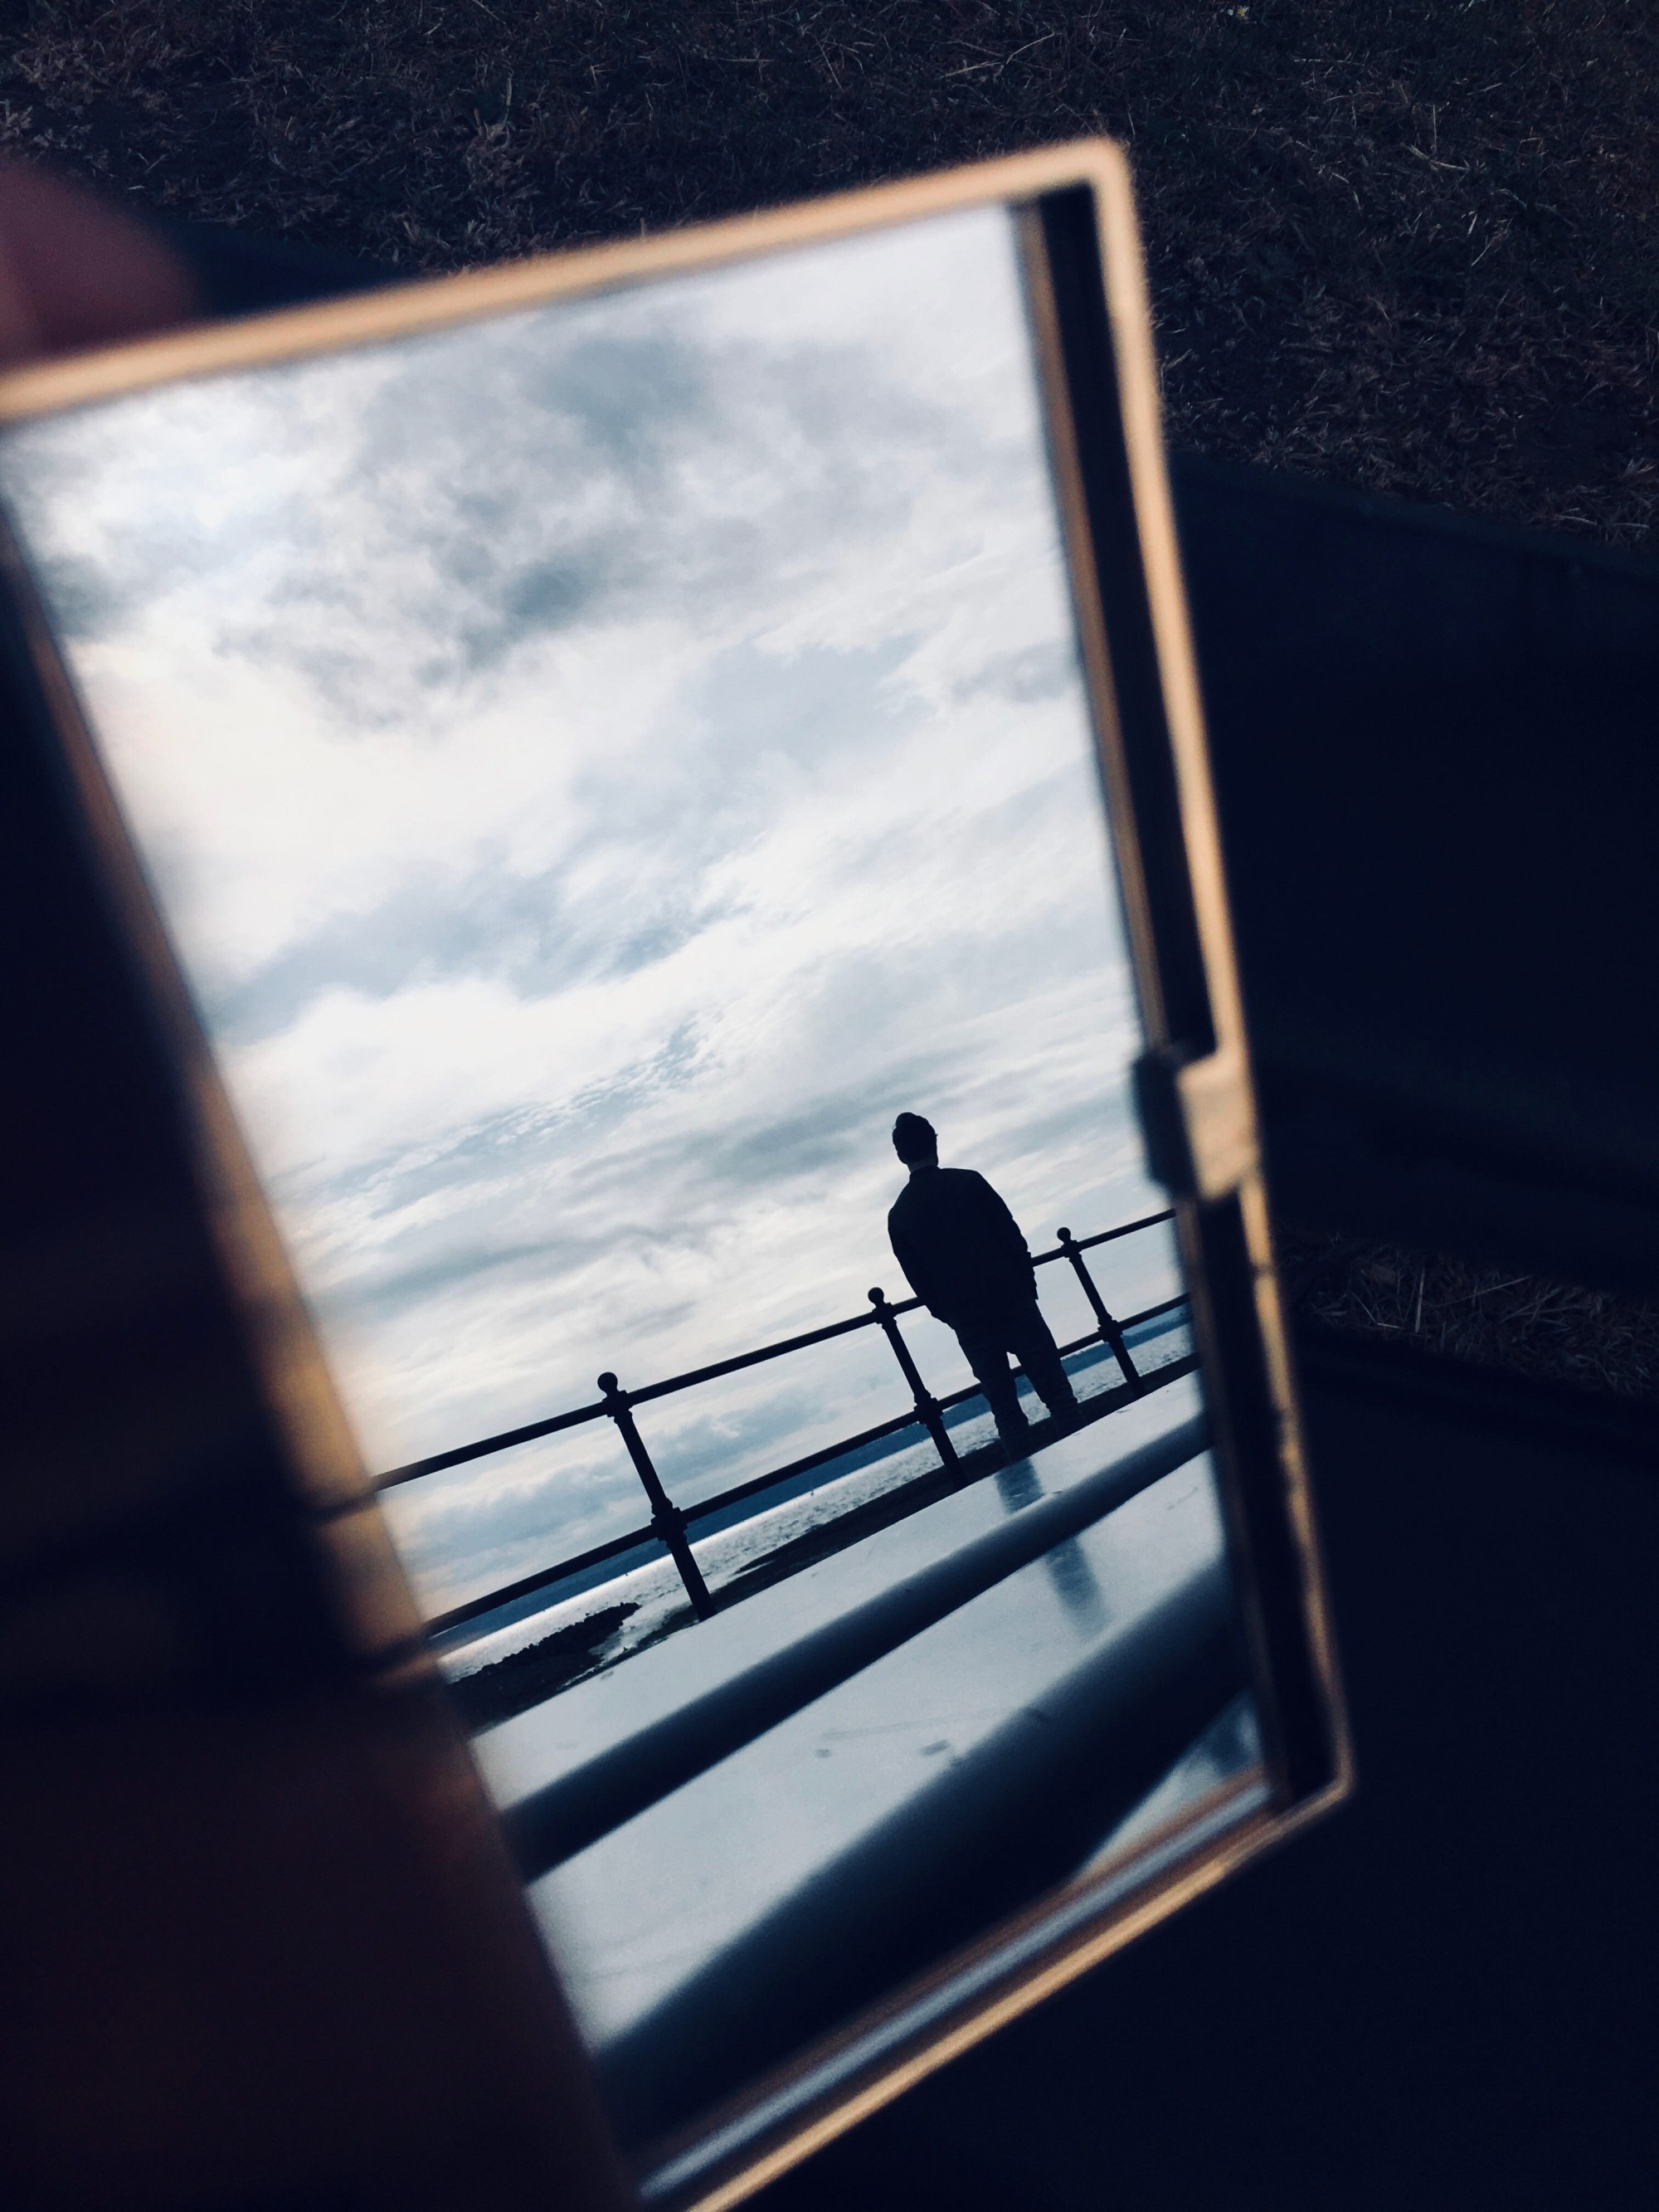 James McLaughlin EP 'Reflections' Cover Art